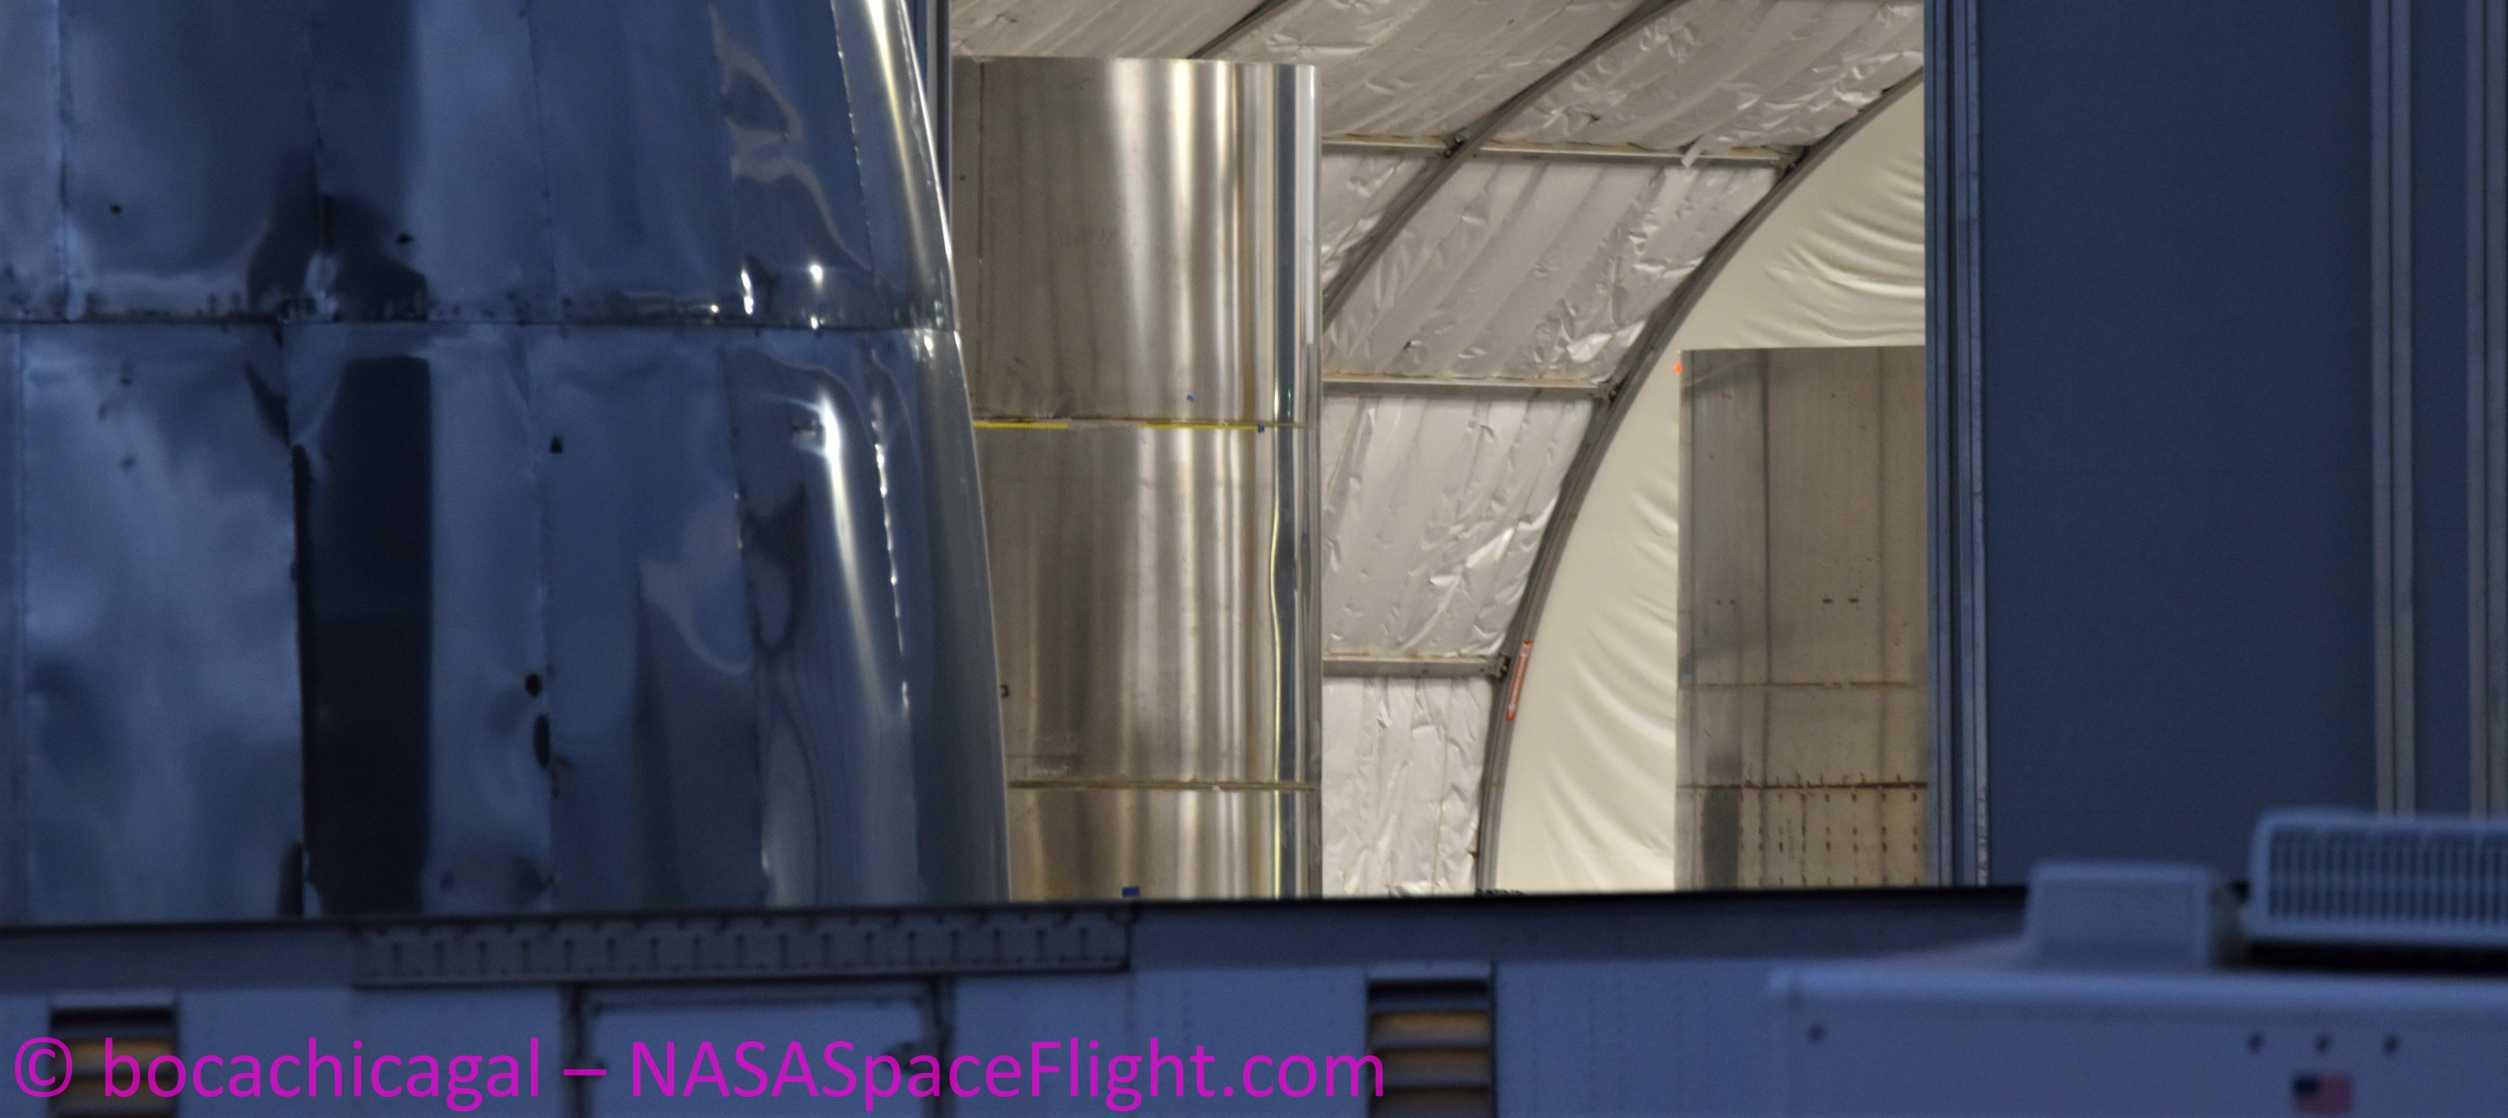 Starship Boca Chica 041520 (NASASpaceflight – bocachicagal) SN5 barrels 1 crop (c)